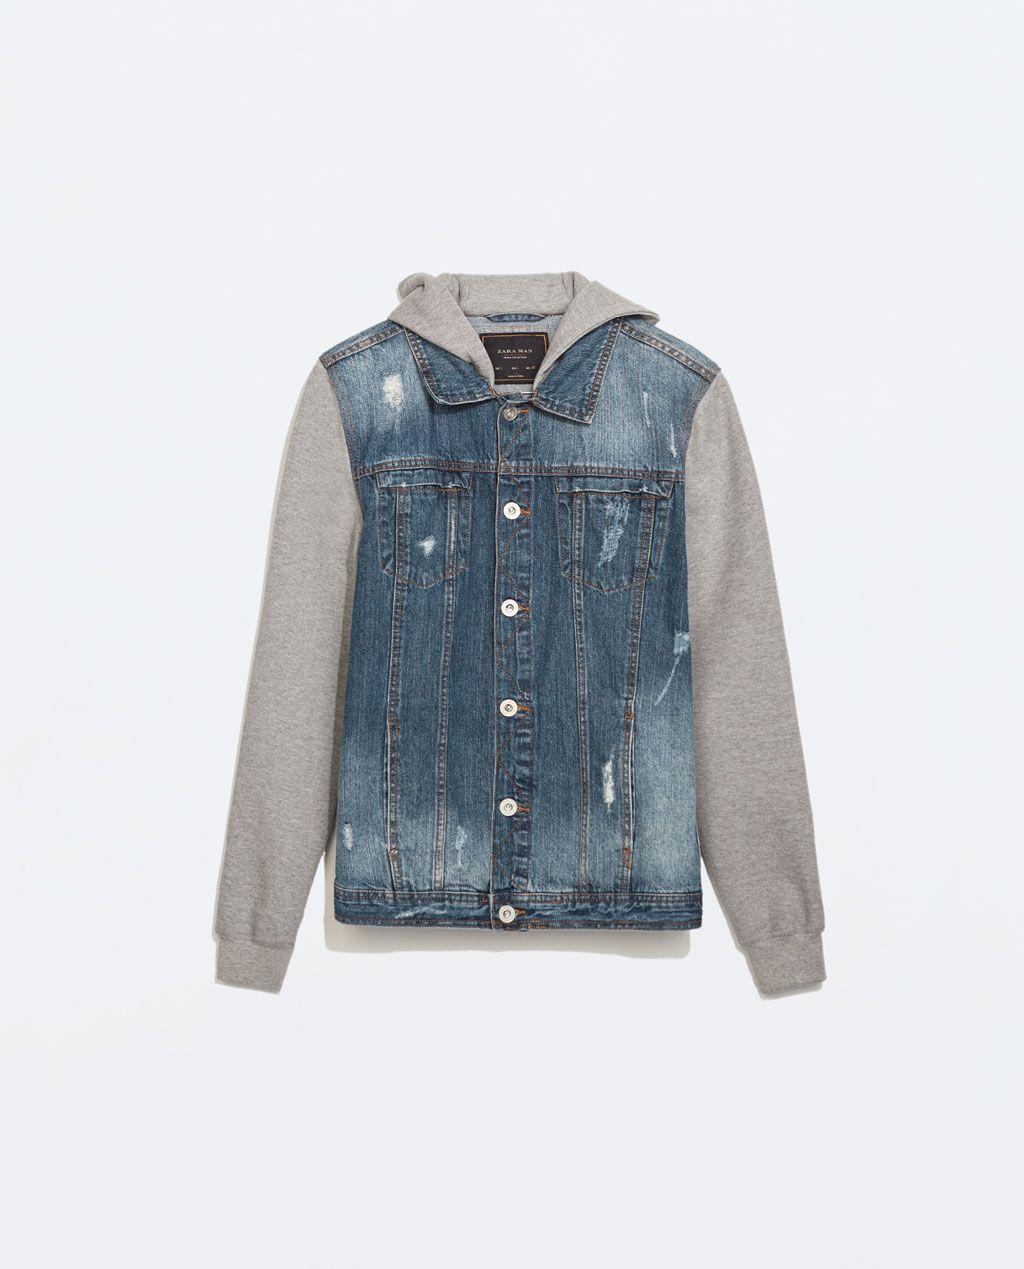 Zara Man Denim Jacket With Fleece Sleeves Denim Hoodie Denim Jacket Men Blue Denim Jacket [ 1269 x 1024 Pixel ]